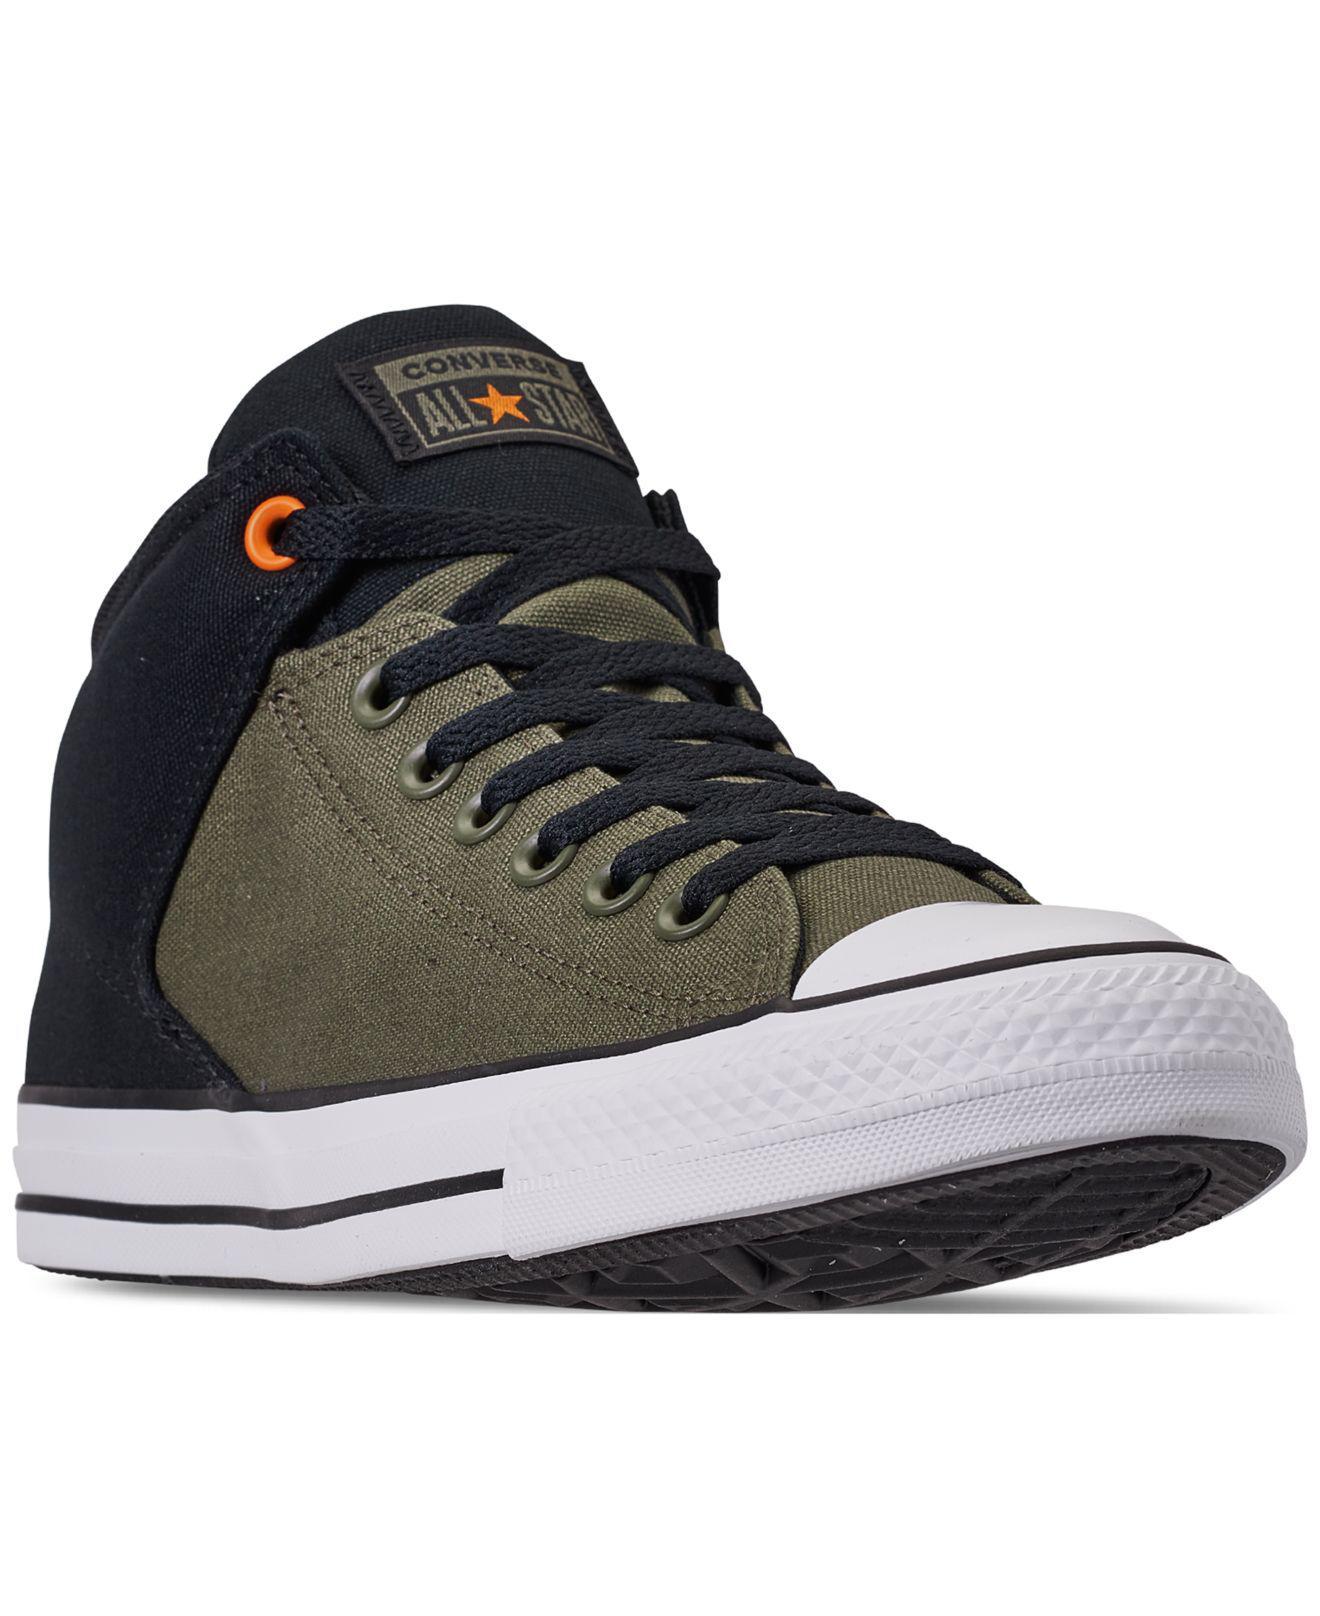 f01a4f11453f Converse. Men s Black Chuck Taylor All Star High Street Casual Sneakers ...